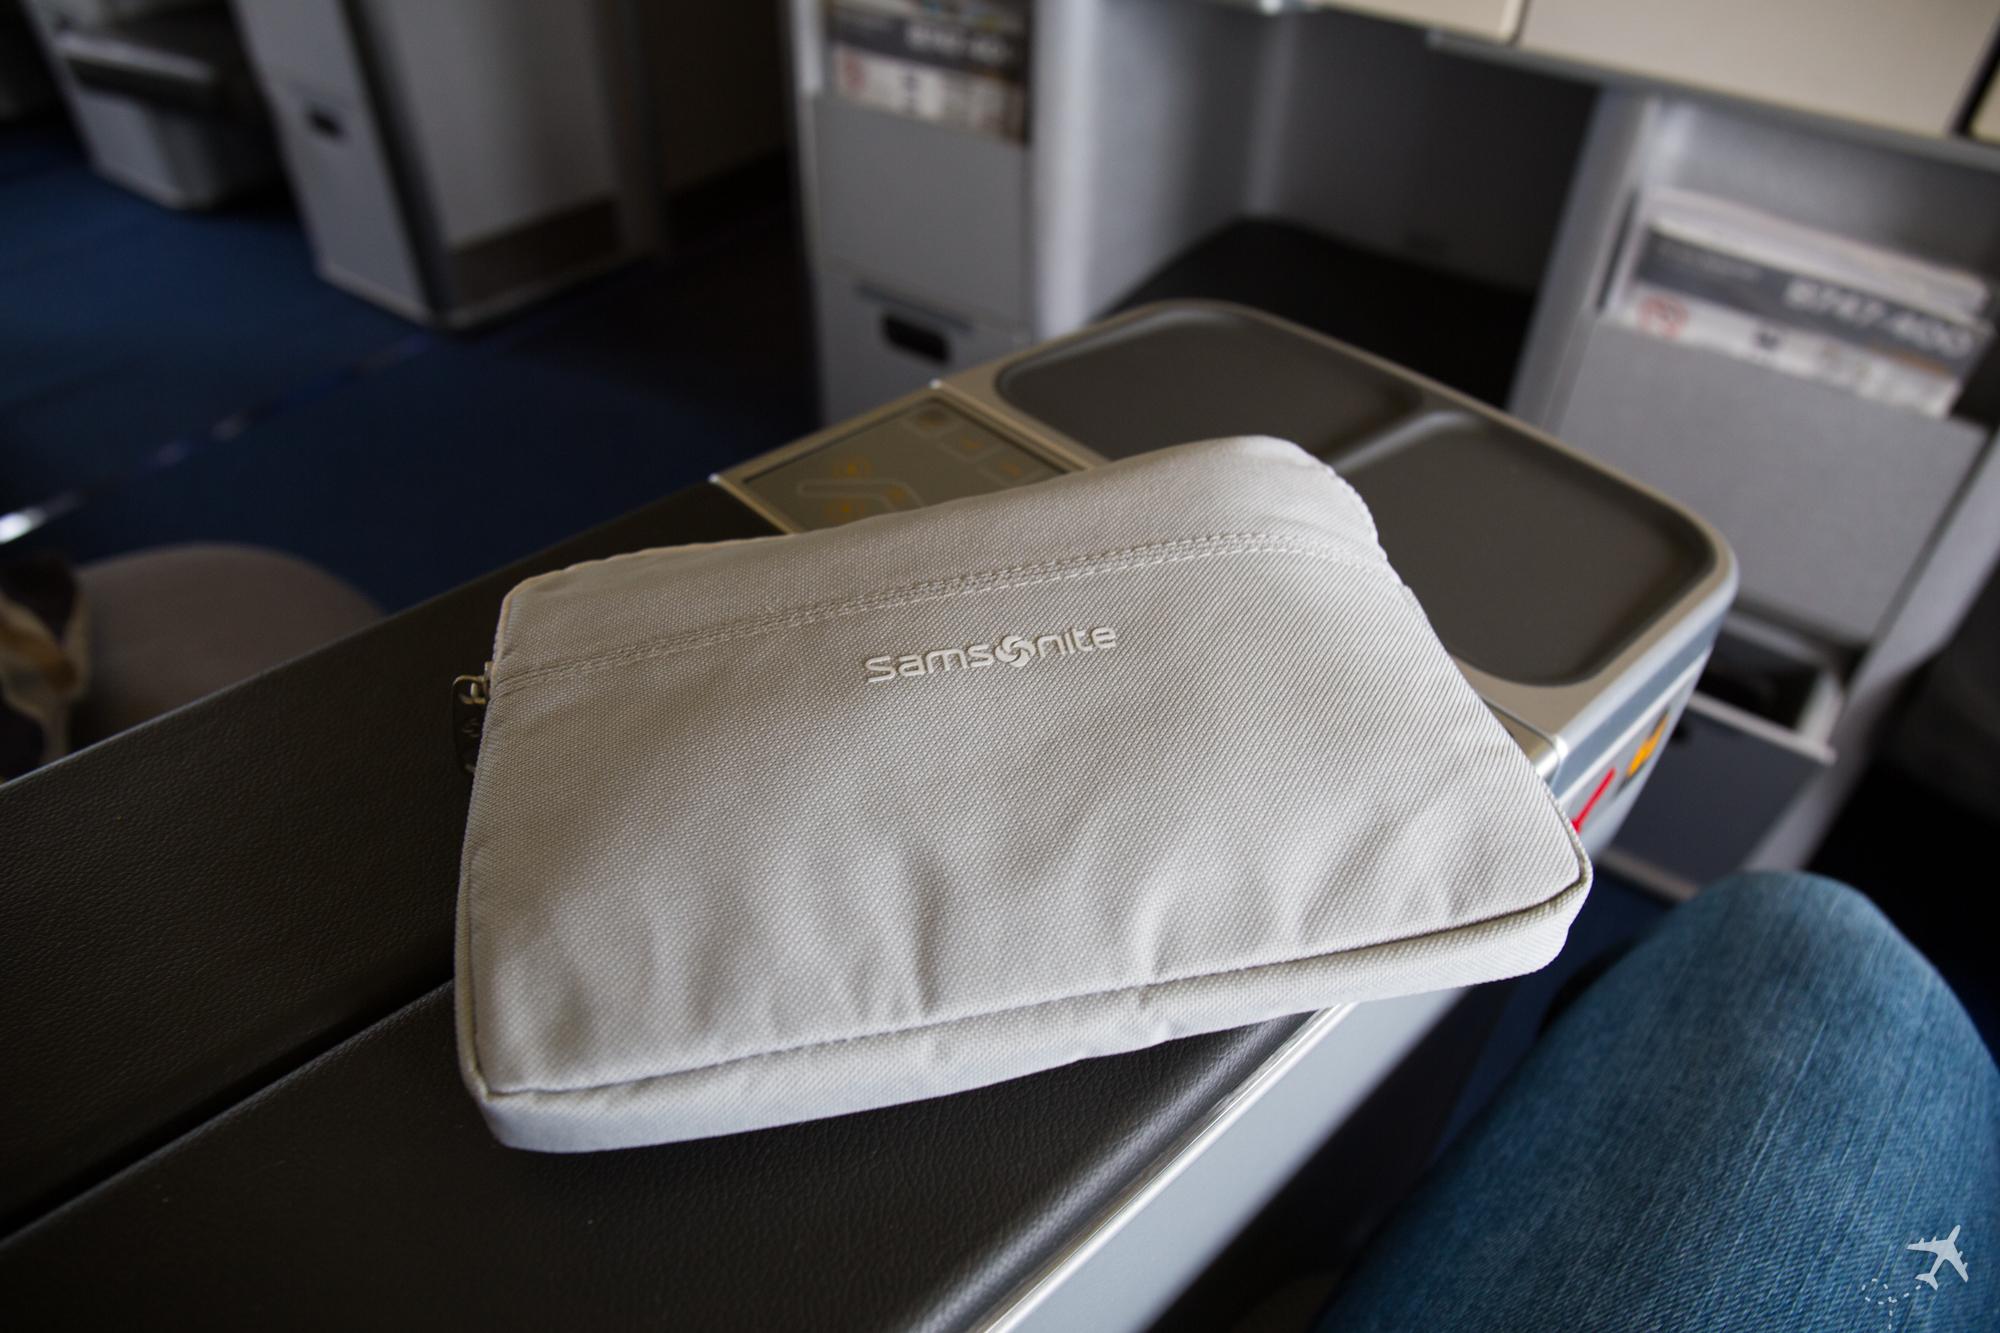 Lufthansa Business Class Amenity Kit